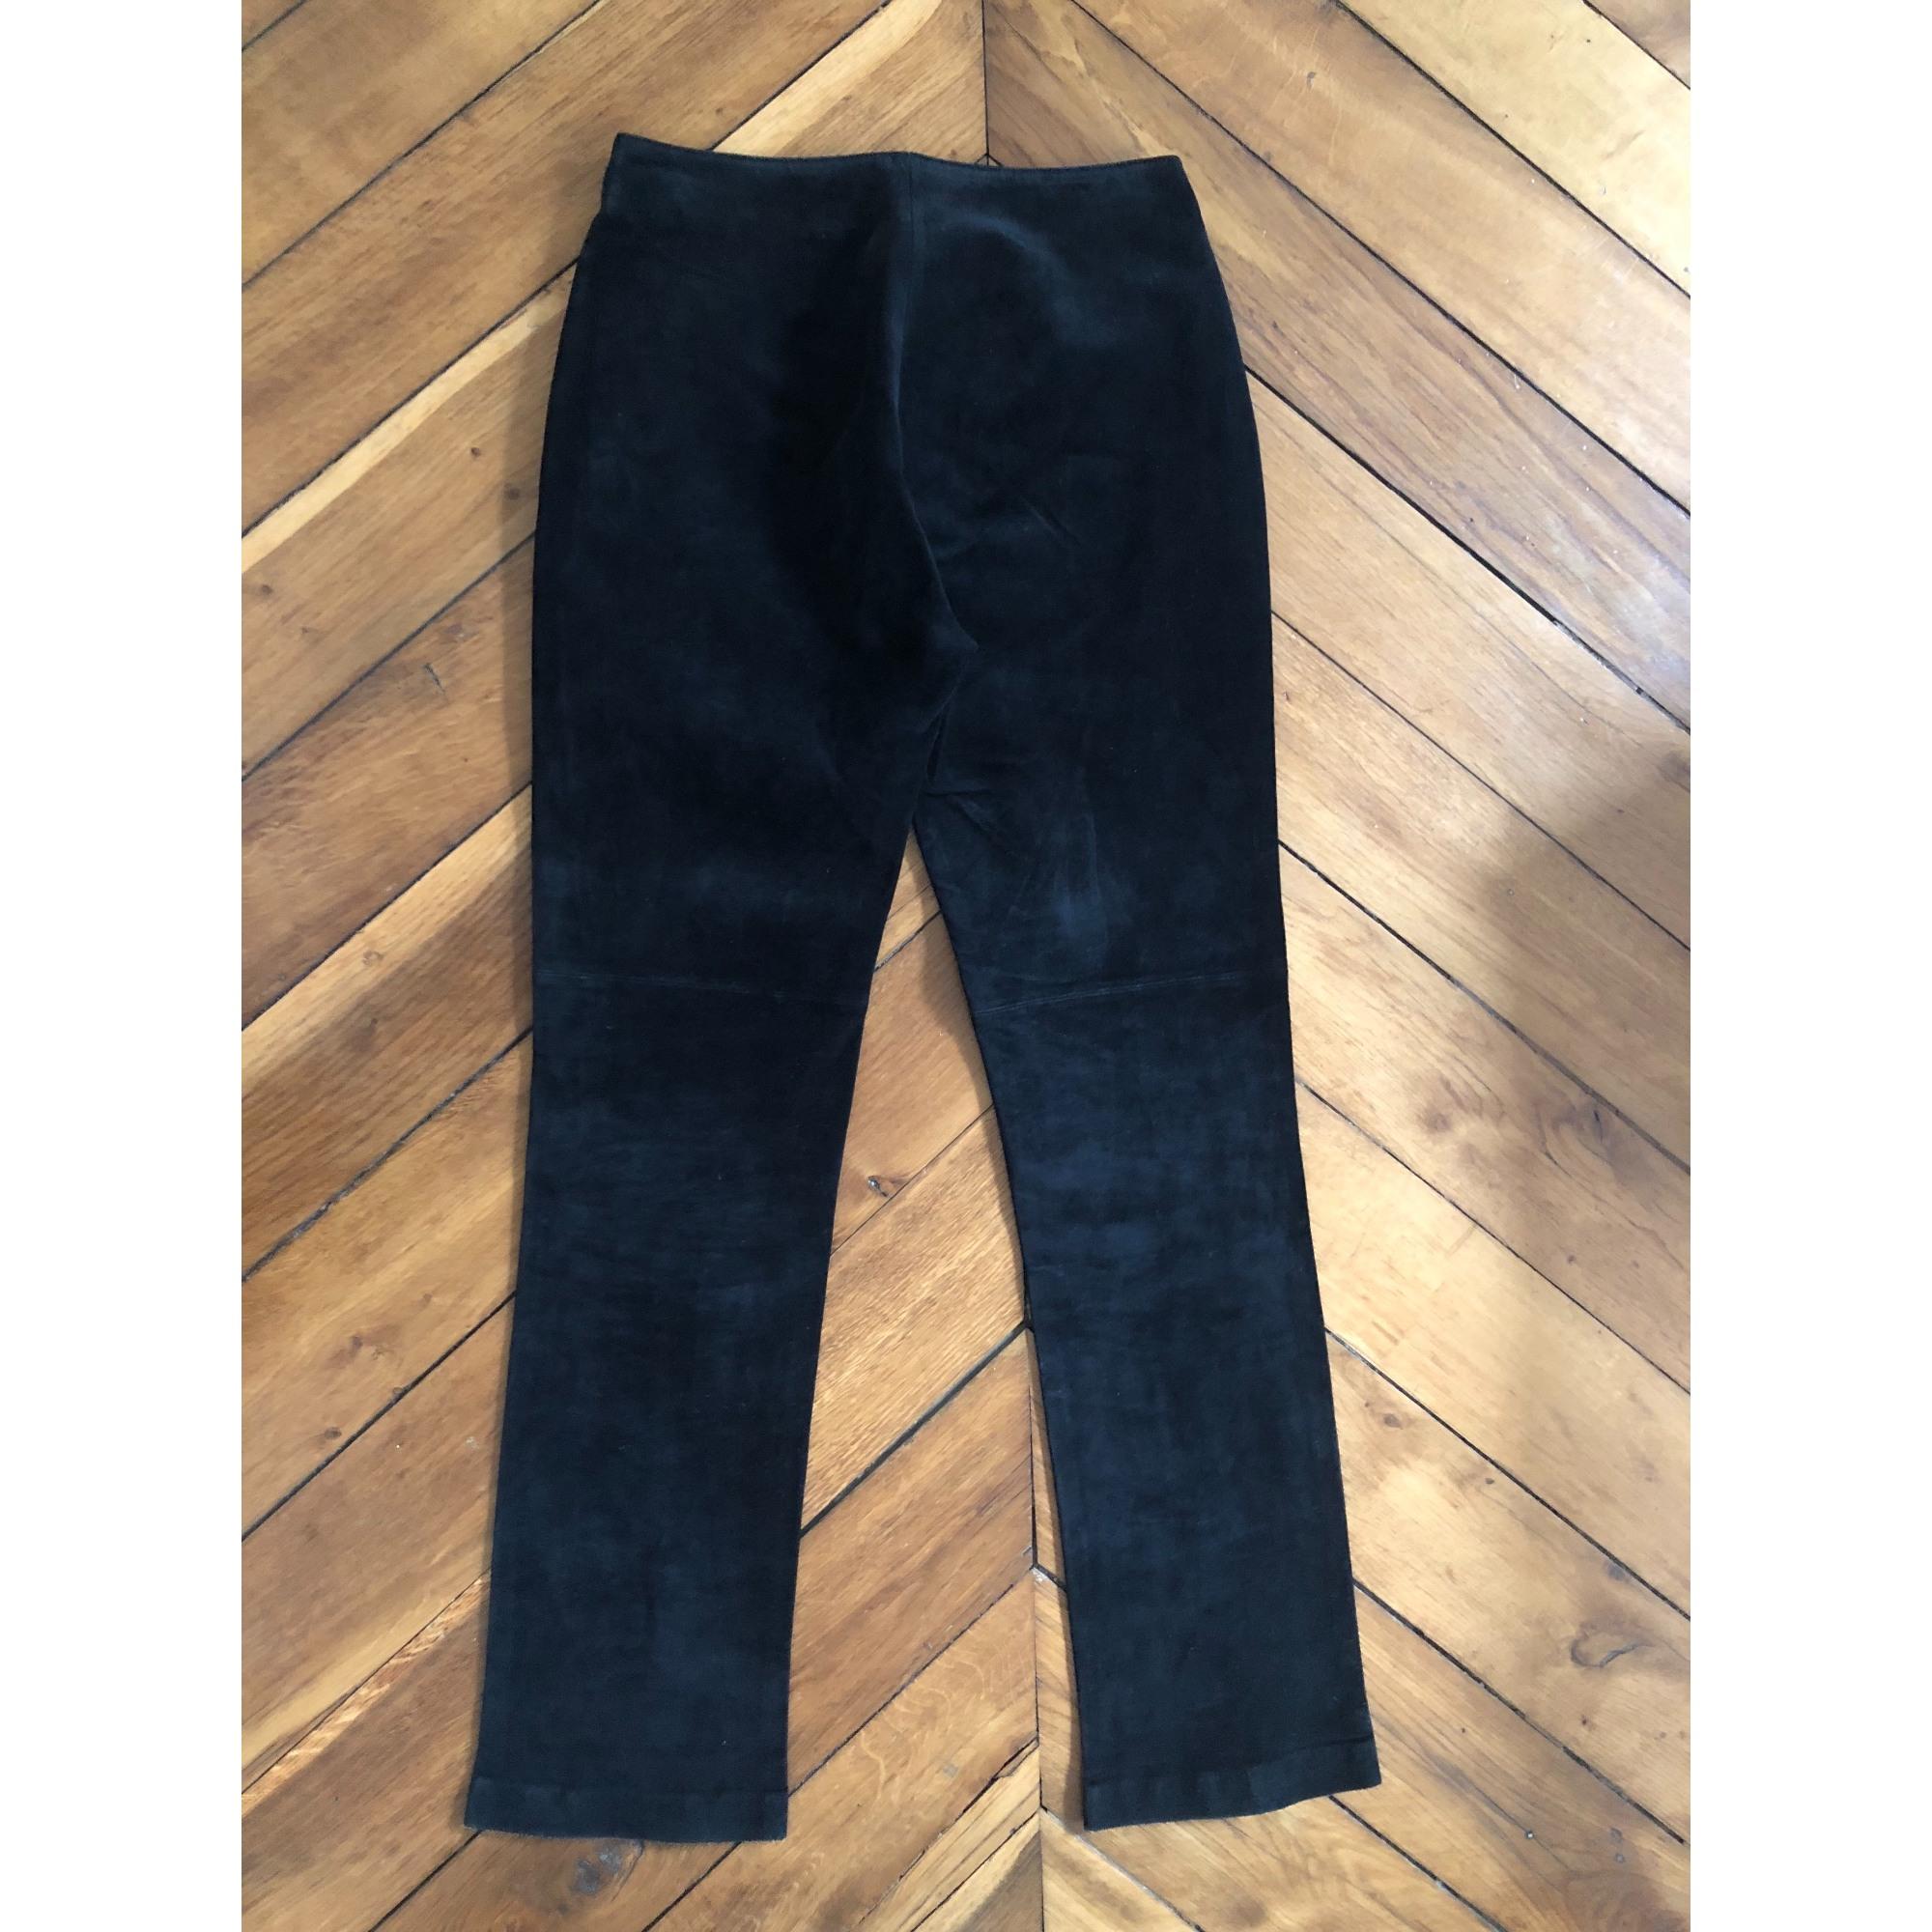 Pantalon droit 100% VINTAGE Noir